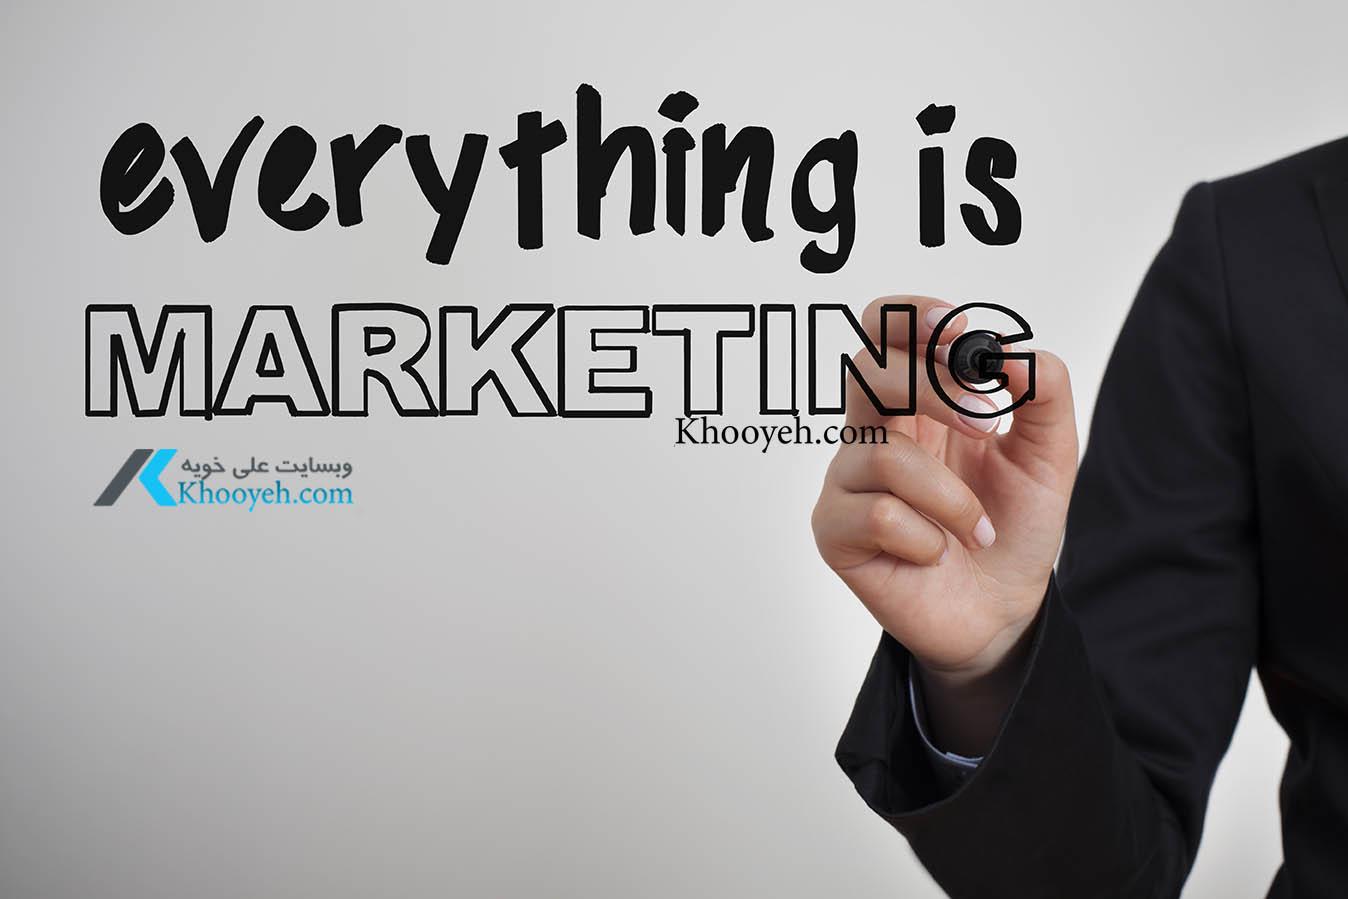 Photo of پنج اصل حیاتی درباره بازاریابی از نگاه آنتونی رابینز: